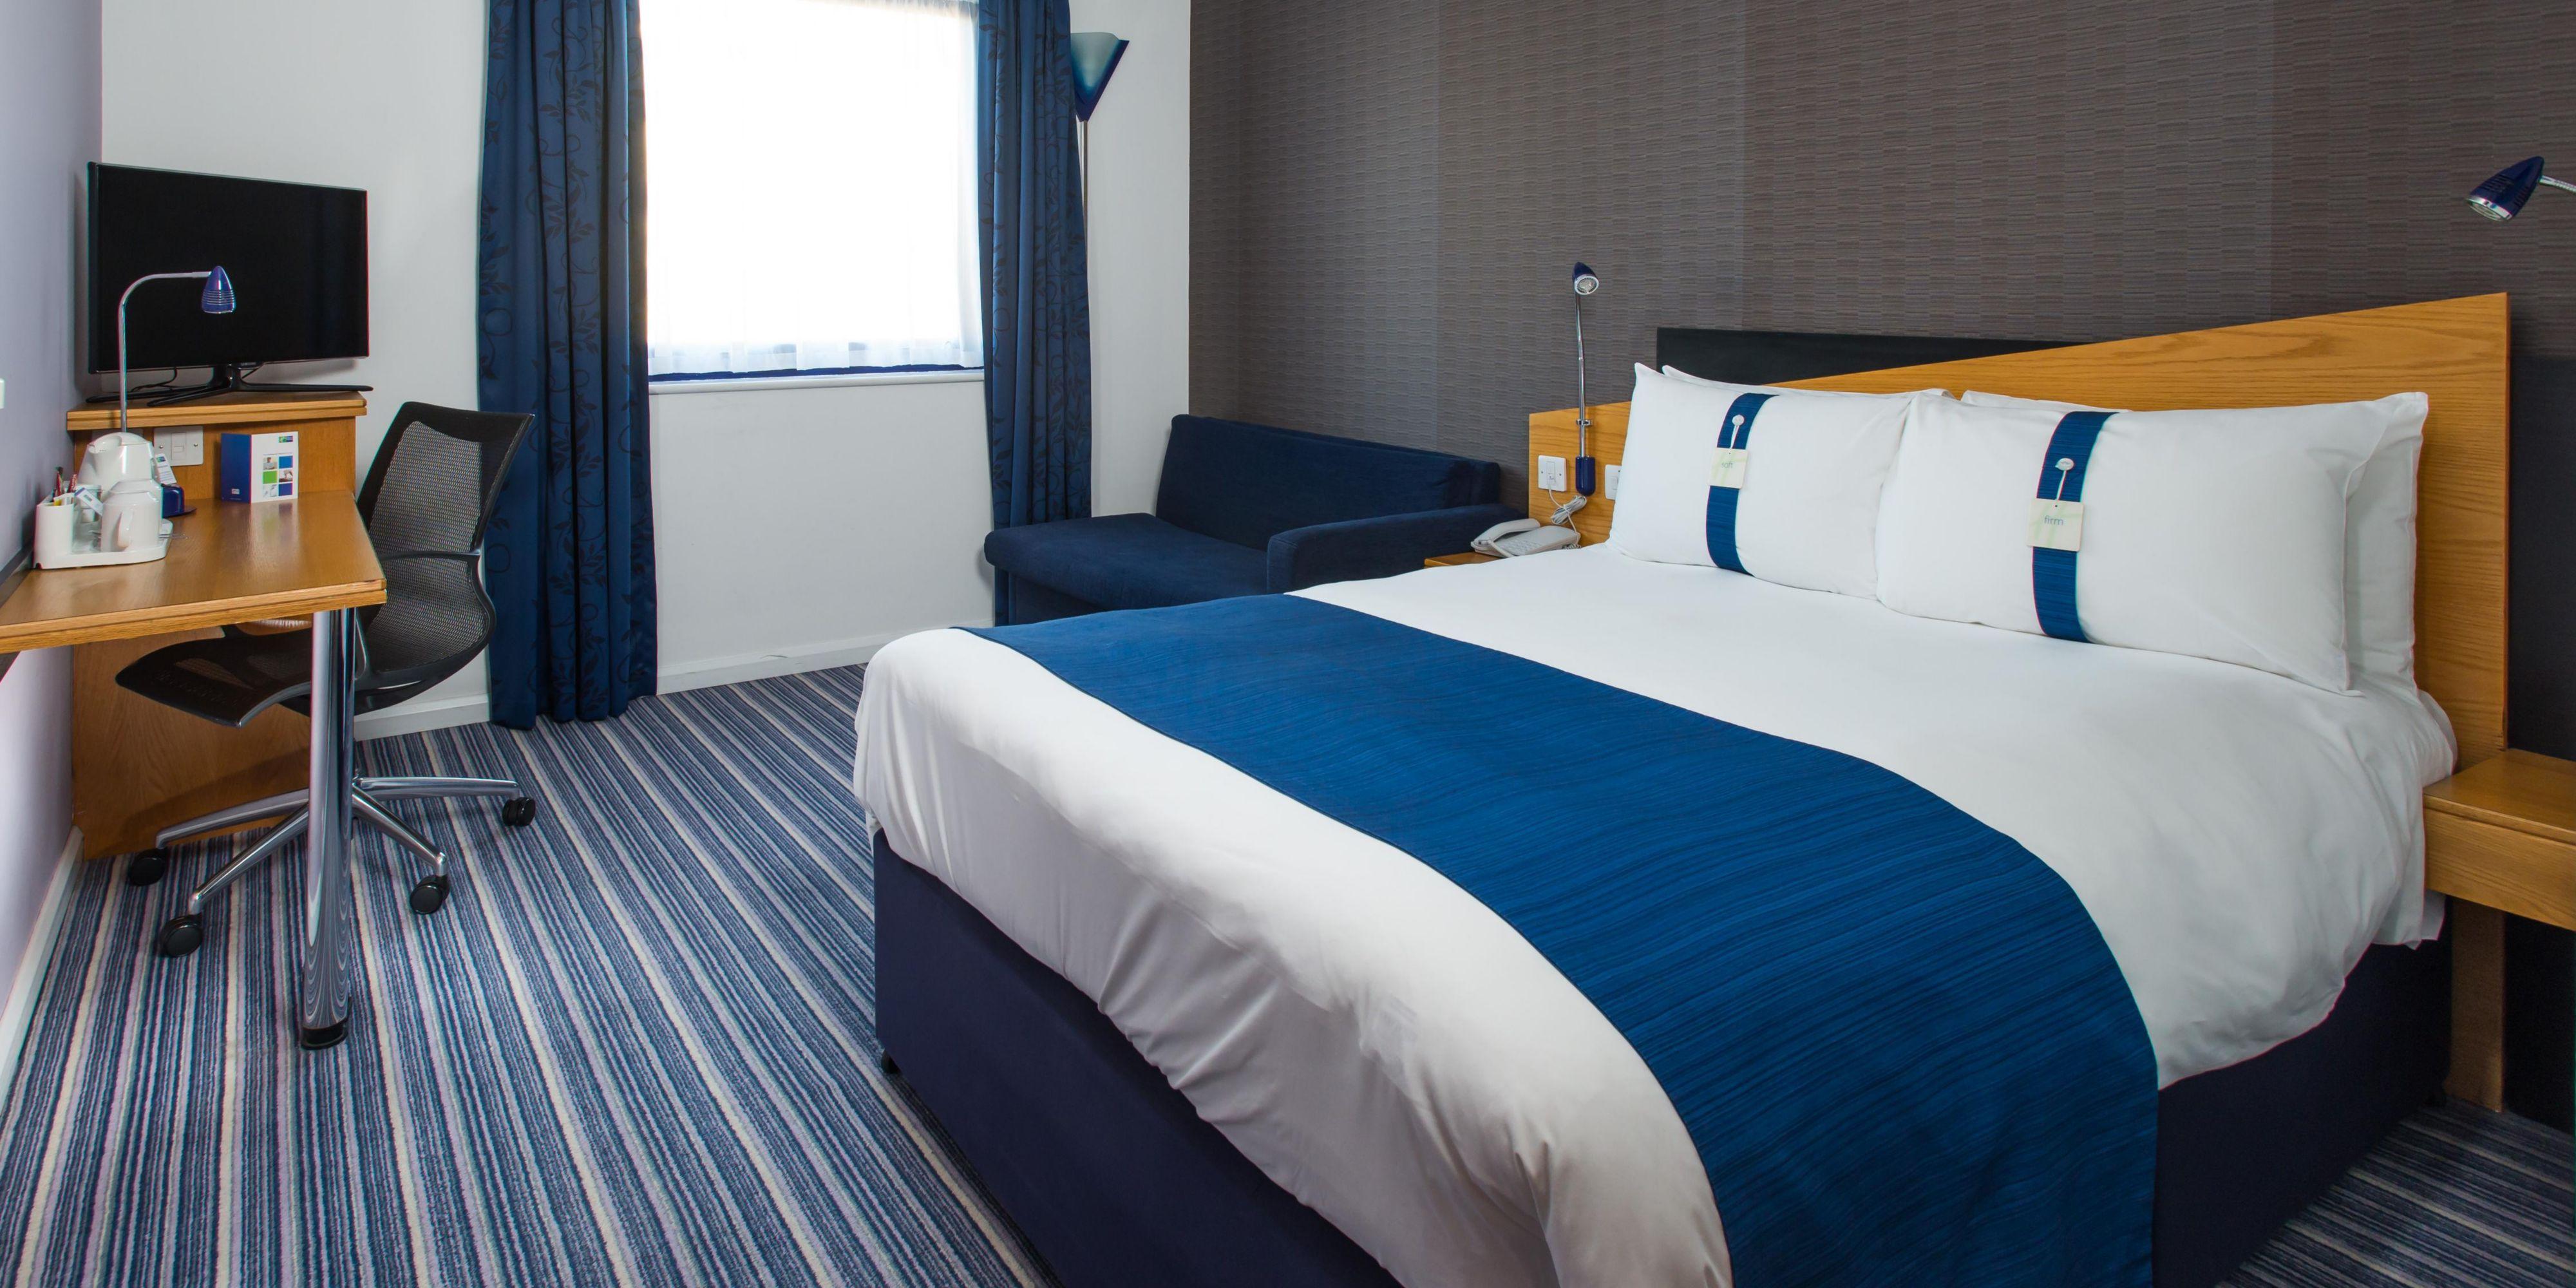 Holiday Inn Express London - Wandsworth Hotel by IHG